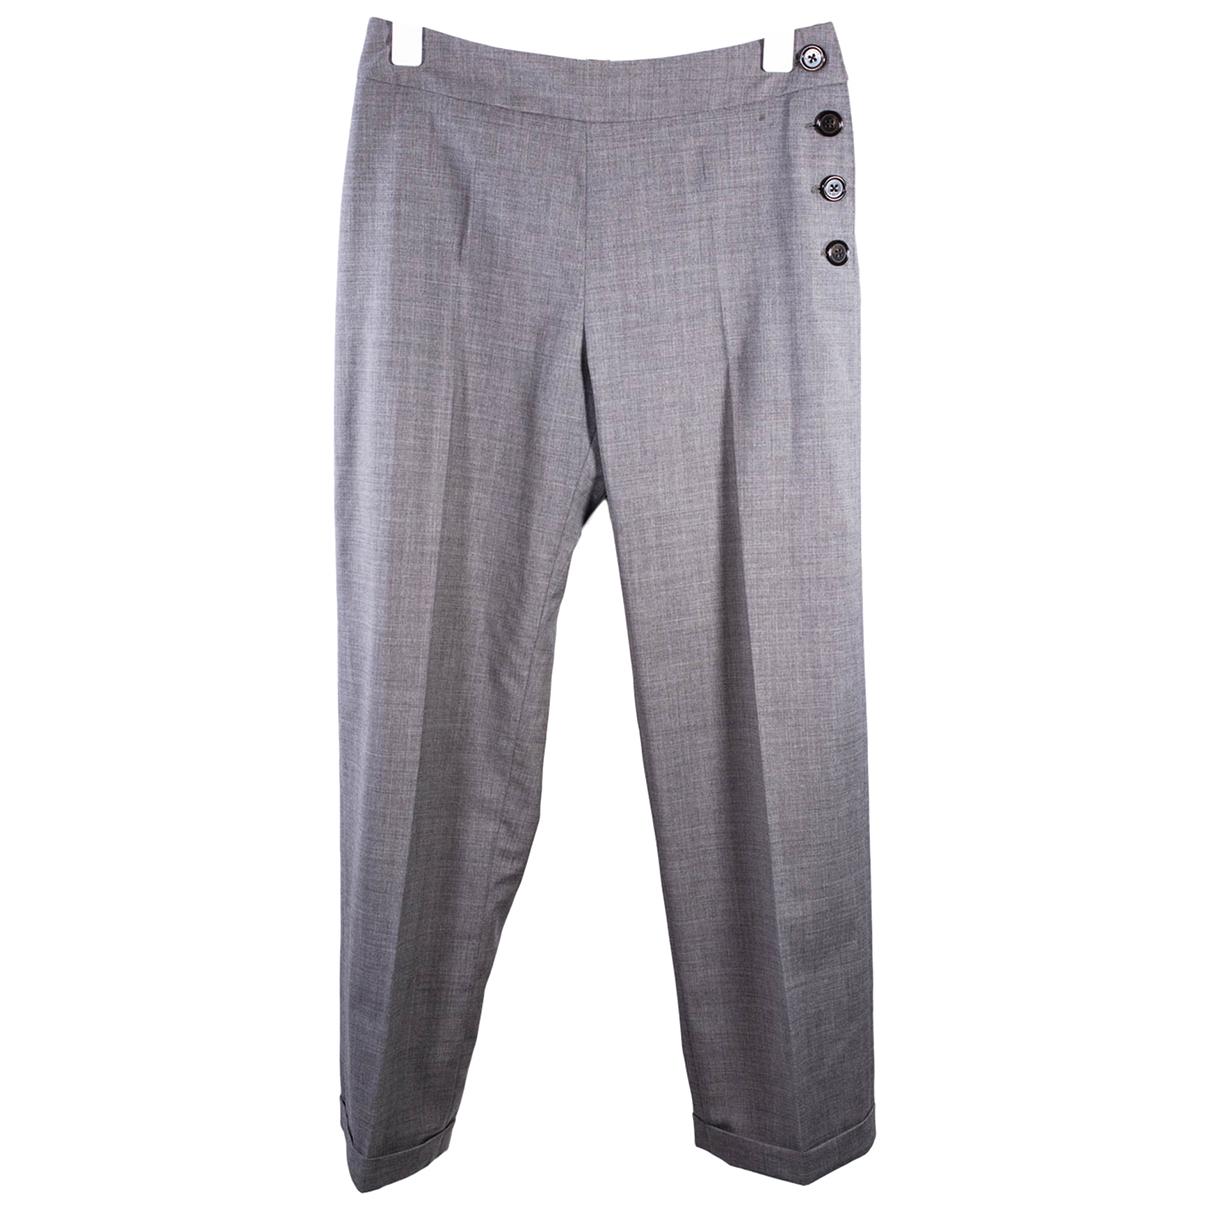 Burberry N Grey Wool Trousers for Women 38 FR